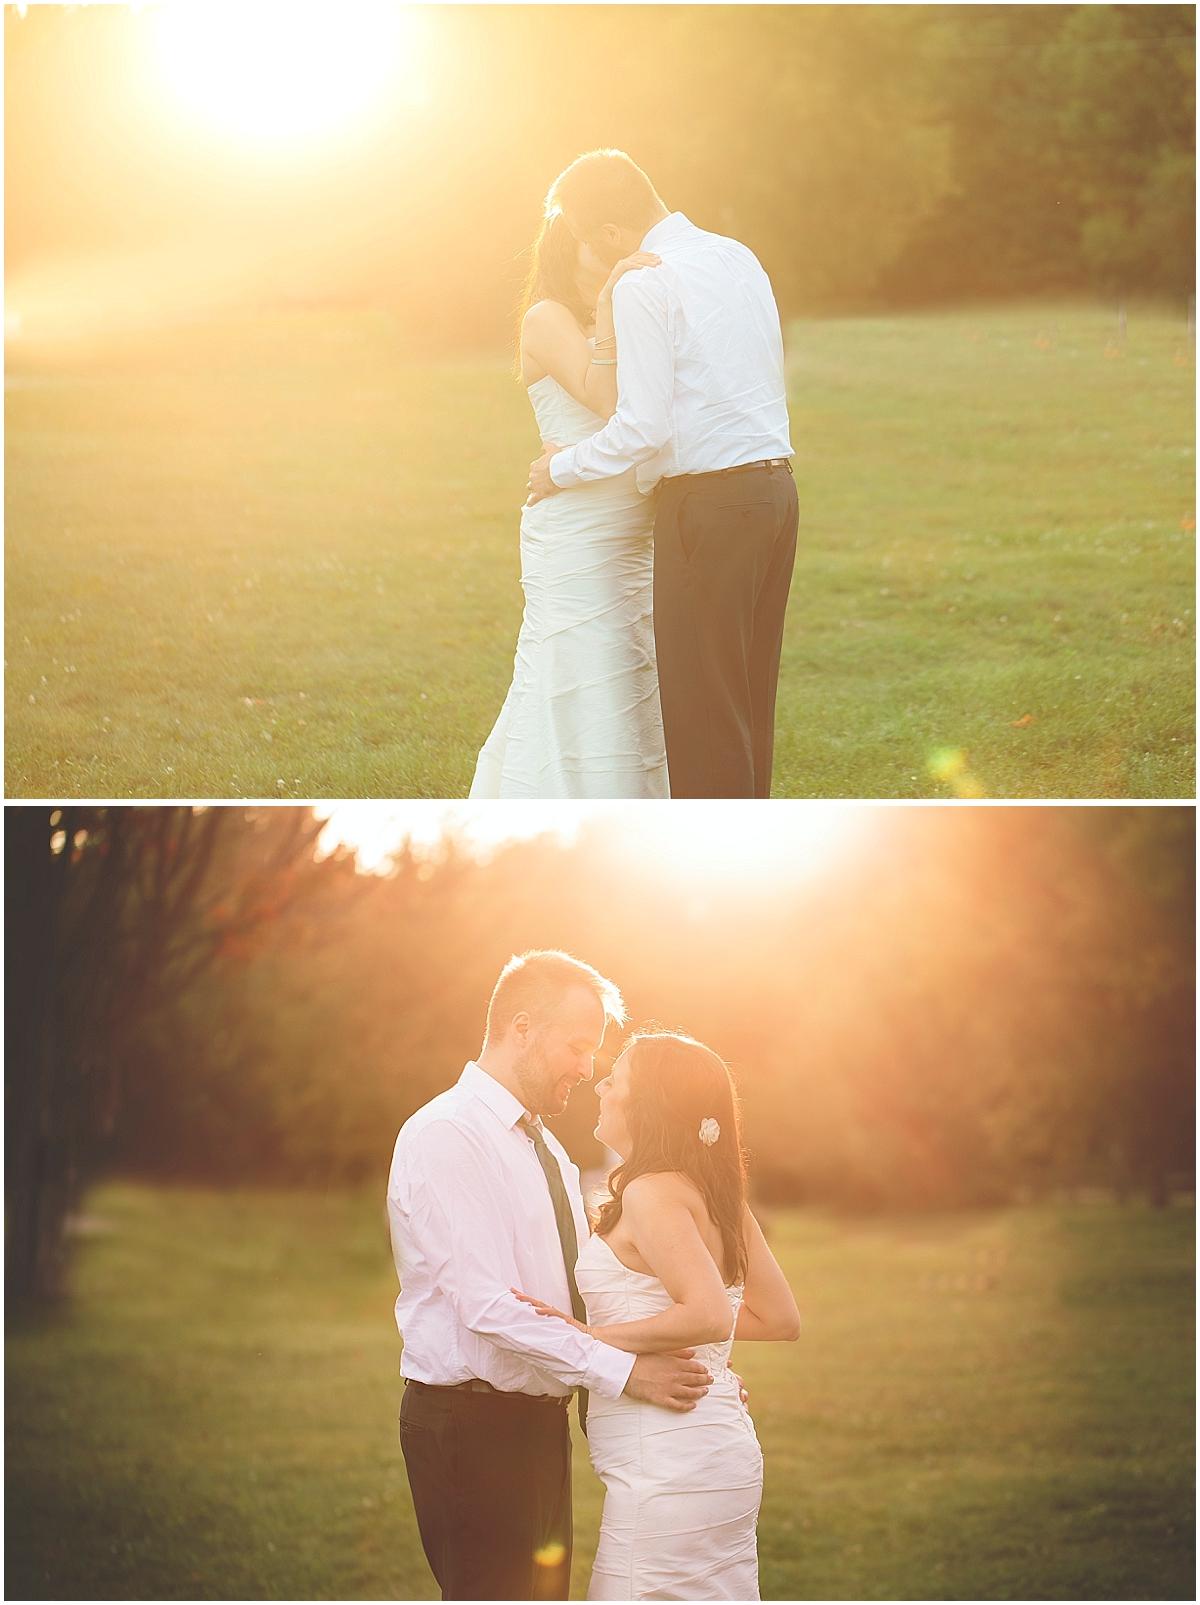 AyshiaMishaWedding649_Alliston wedding photographer.jpg